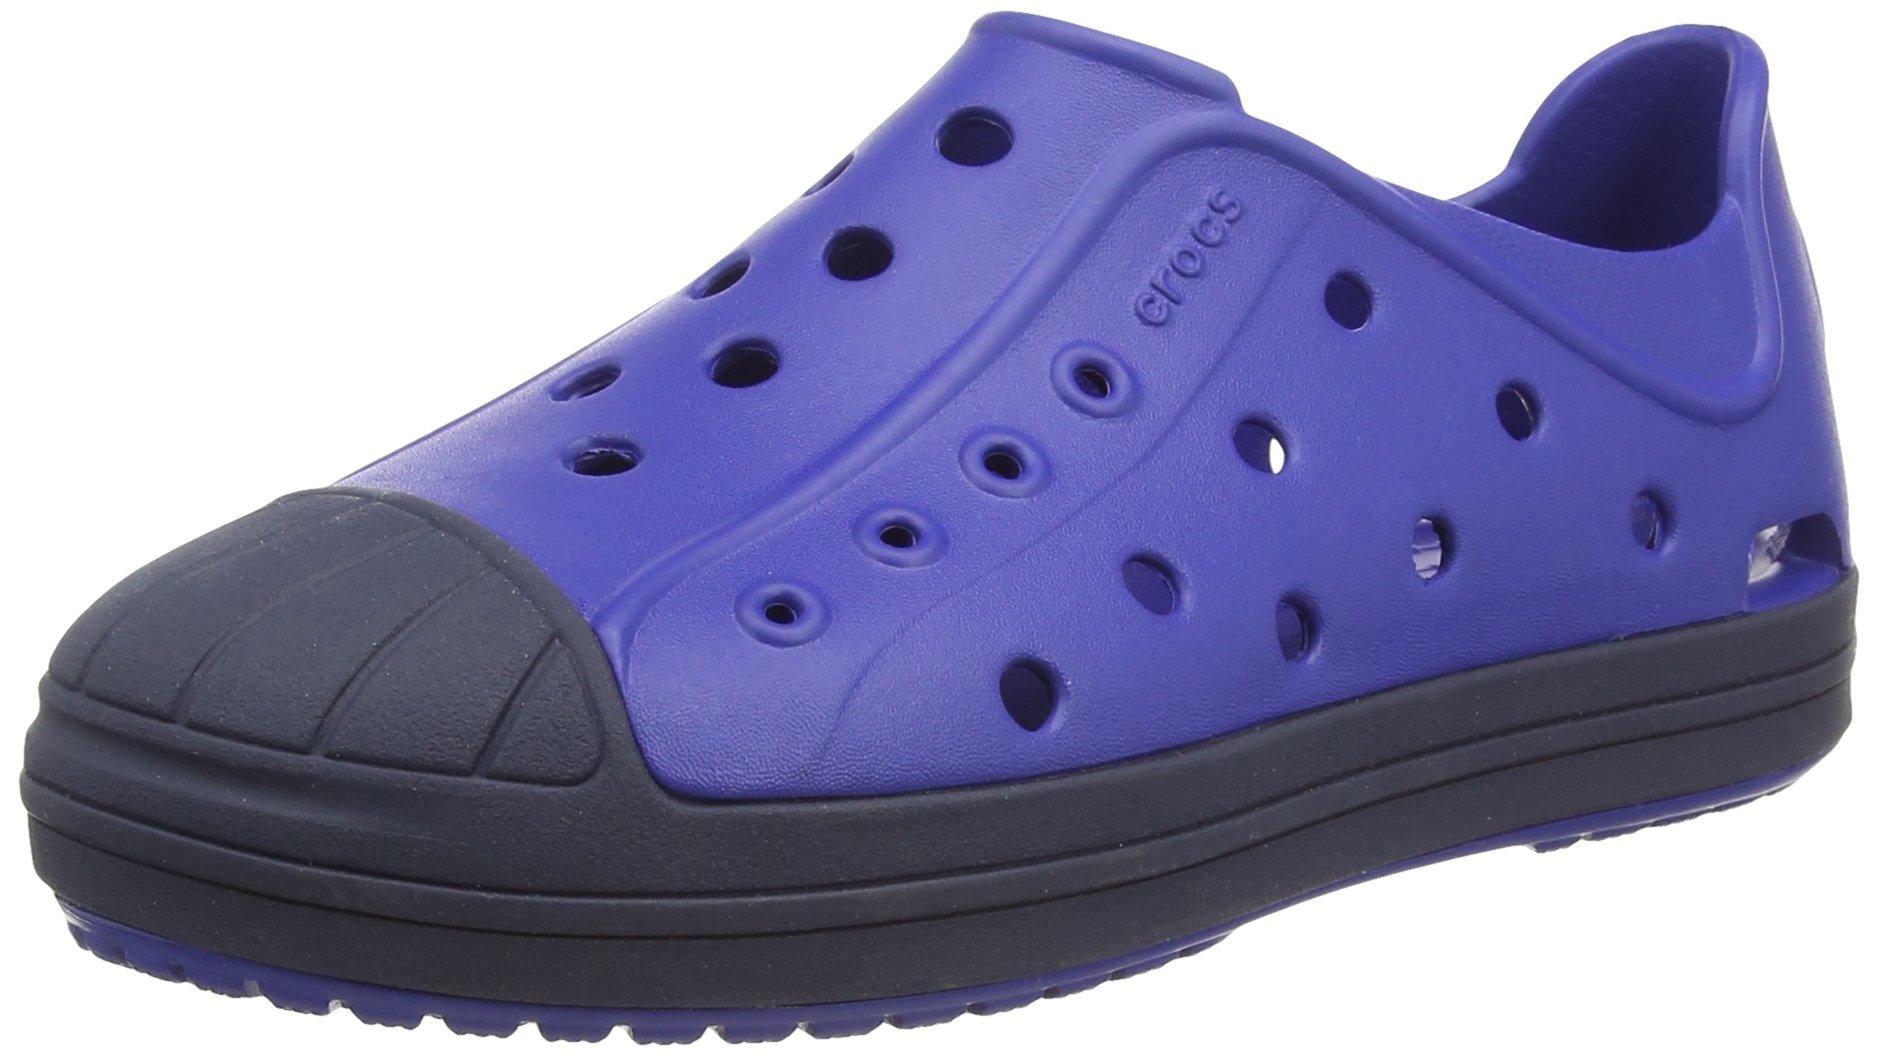 crocs Kids' Bump It Shoe (Toddler/Little Kid), Cerulean Blue/Navy, 13 M US Little Kid